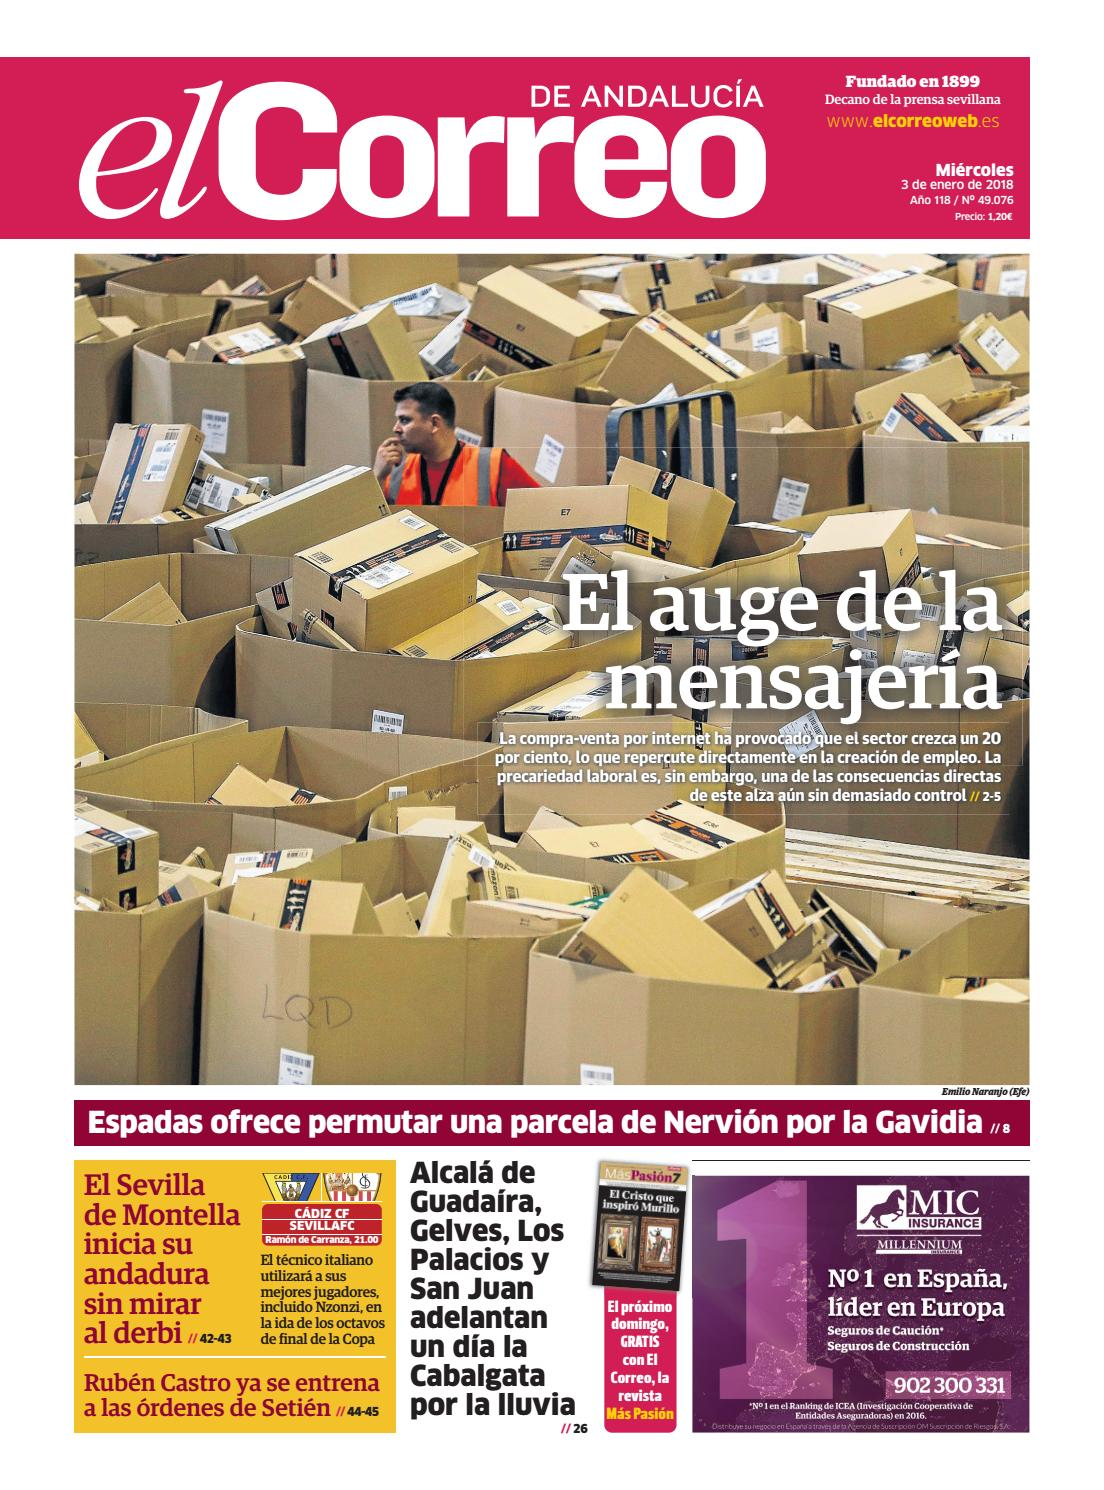 03.01.2018 El Correo de Andalucía by EL CORREO DE ANDALUCÍA S.L. - issuu 84158f8a284c5